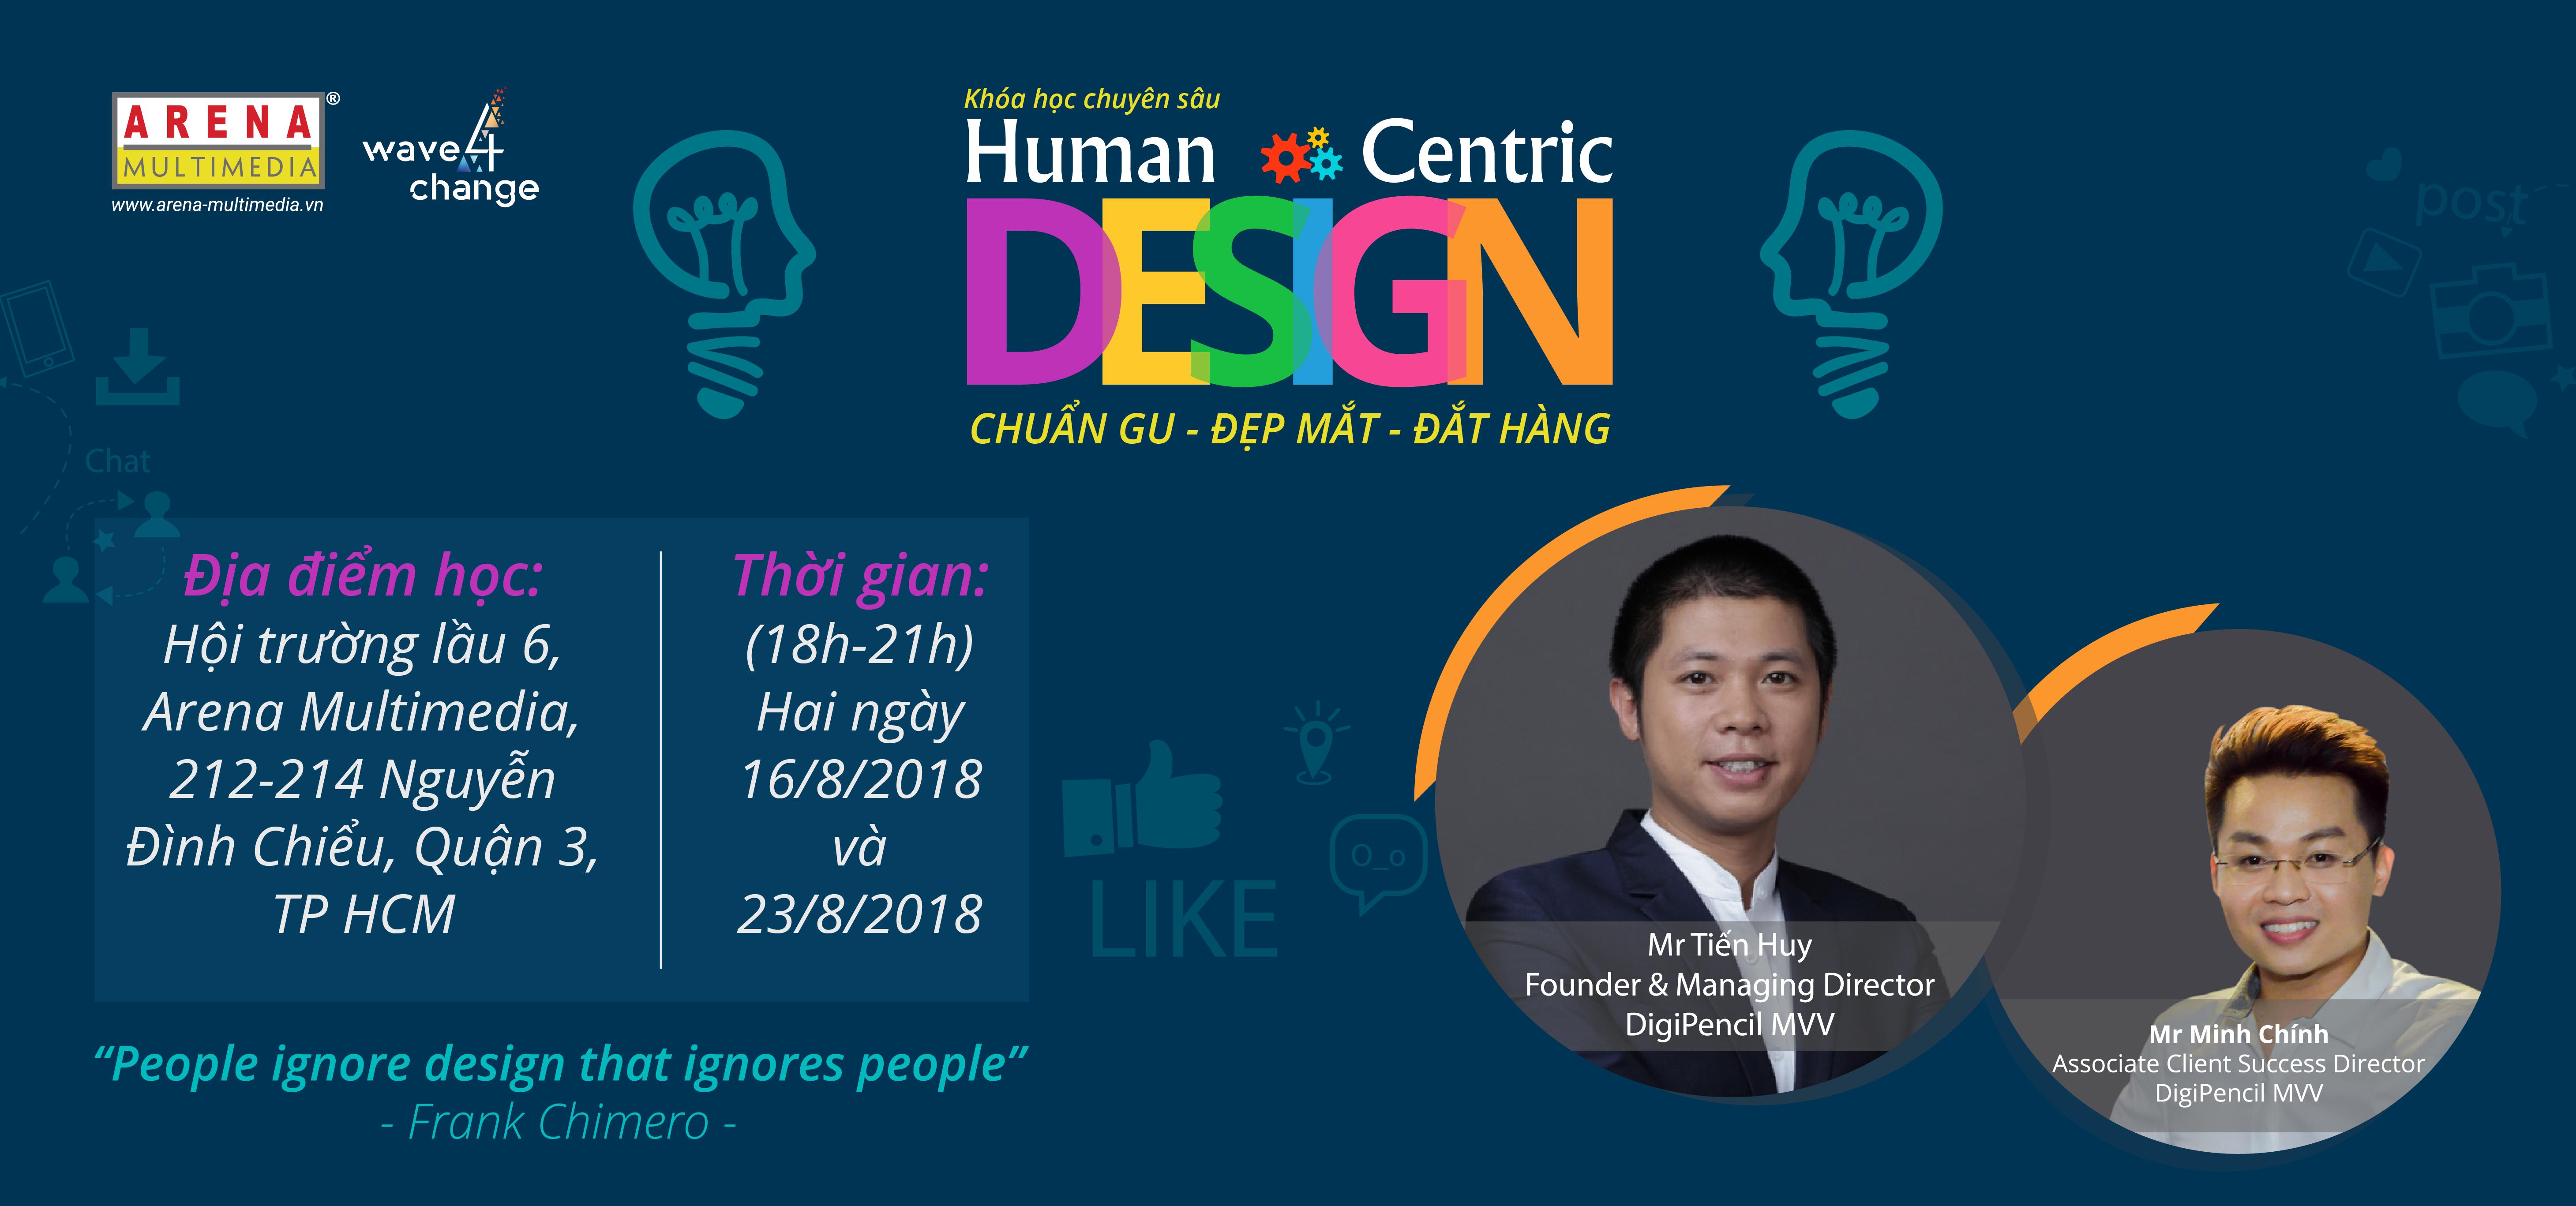 rgb_arena_multimedia_Human-Centric Design POSM ONLINE 782018-02